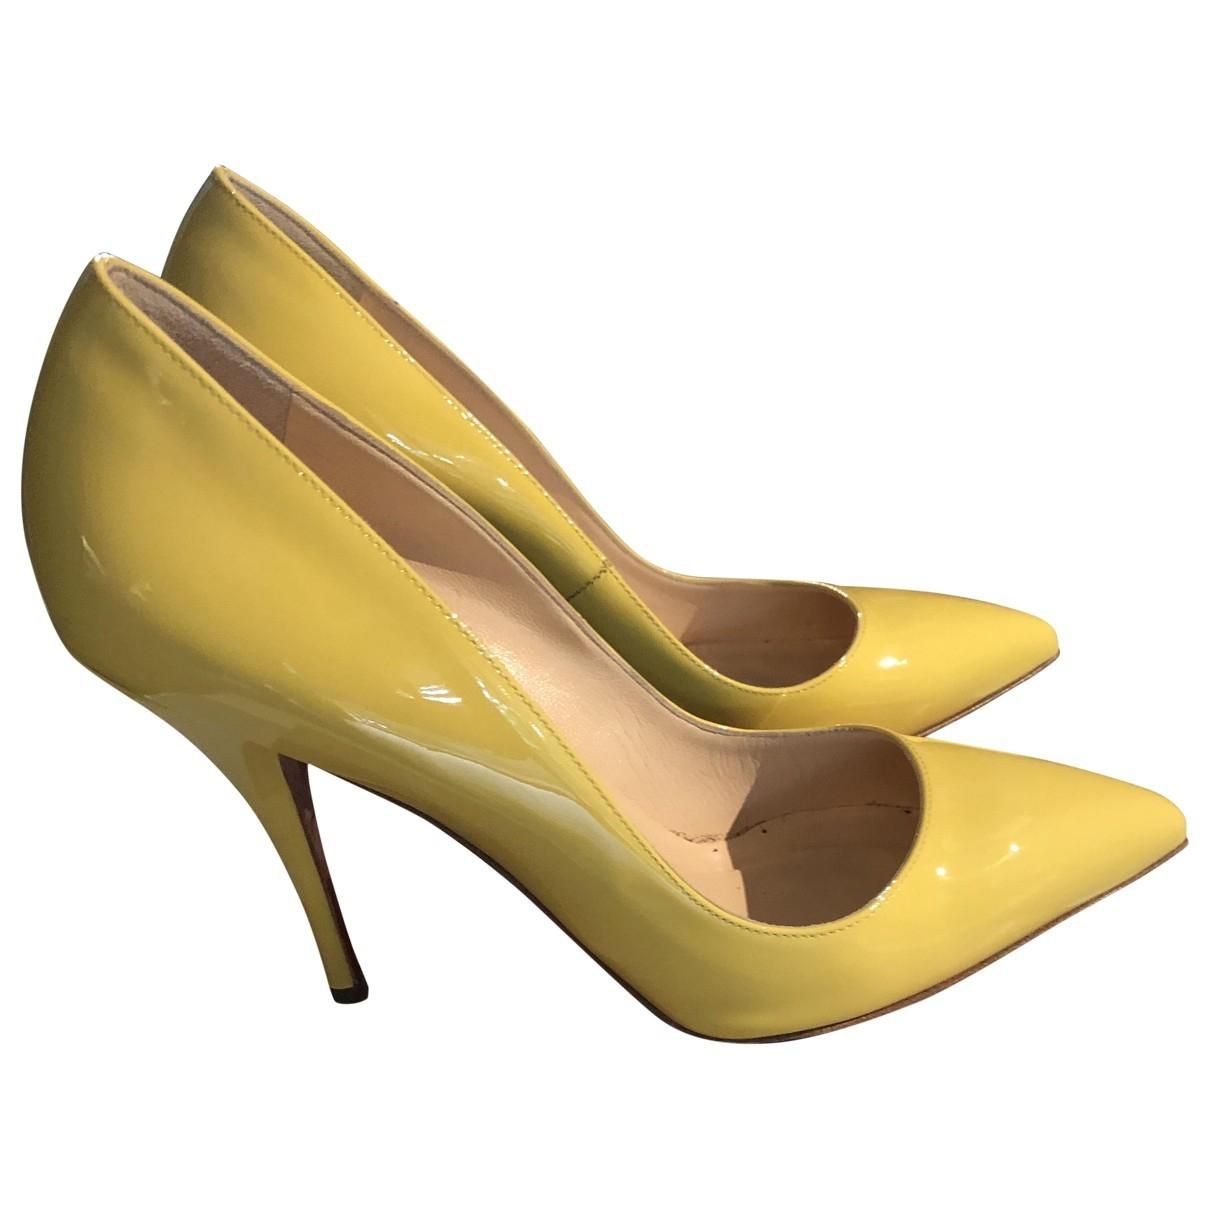 Christian Louboutin \N Yellow Patent leather Heels for Women 37.5 EU